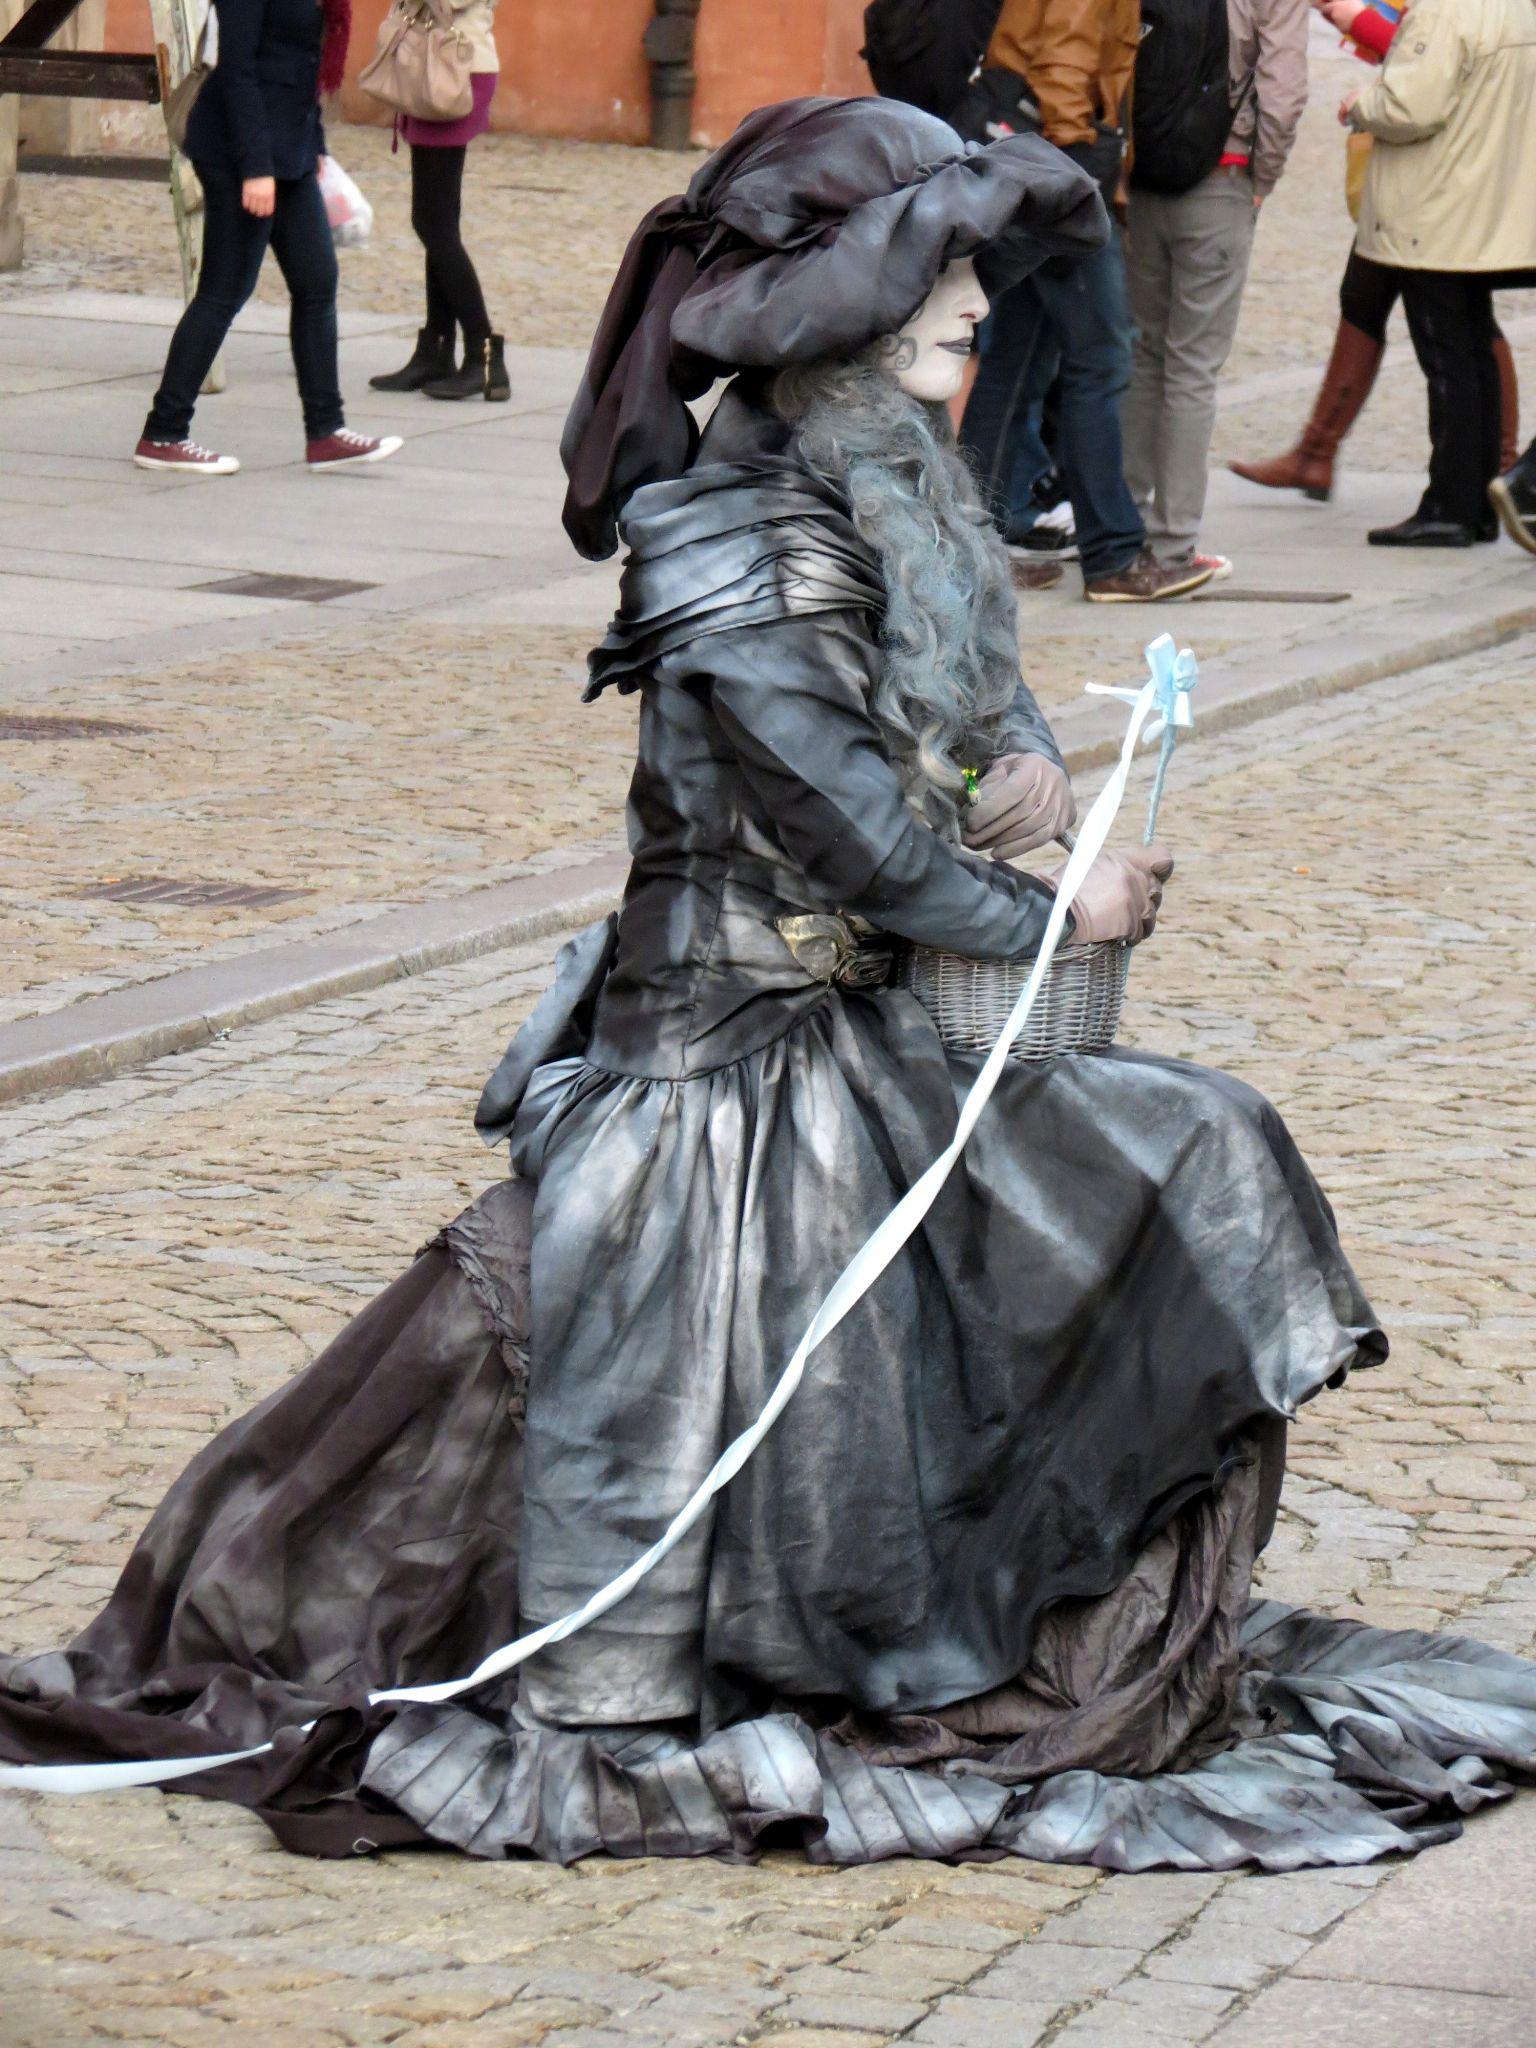 Metallic people in Krakow 4 by christopher.kerkovius